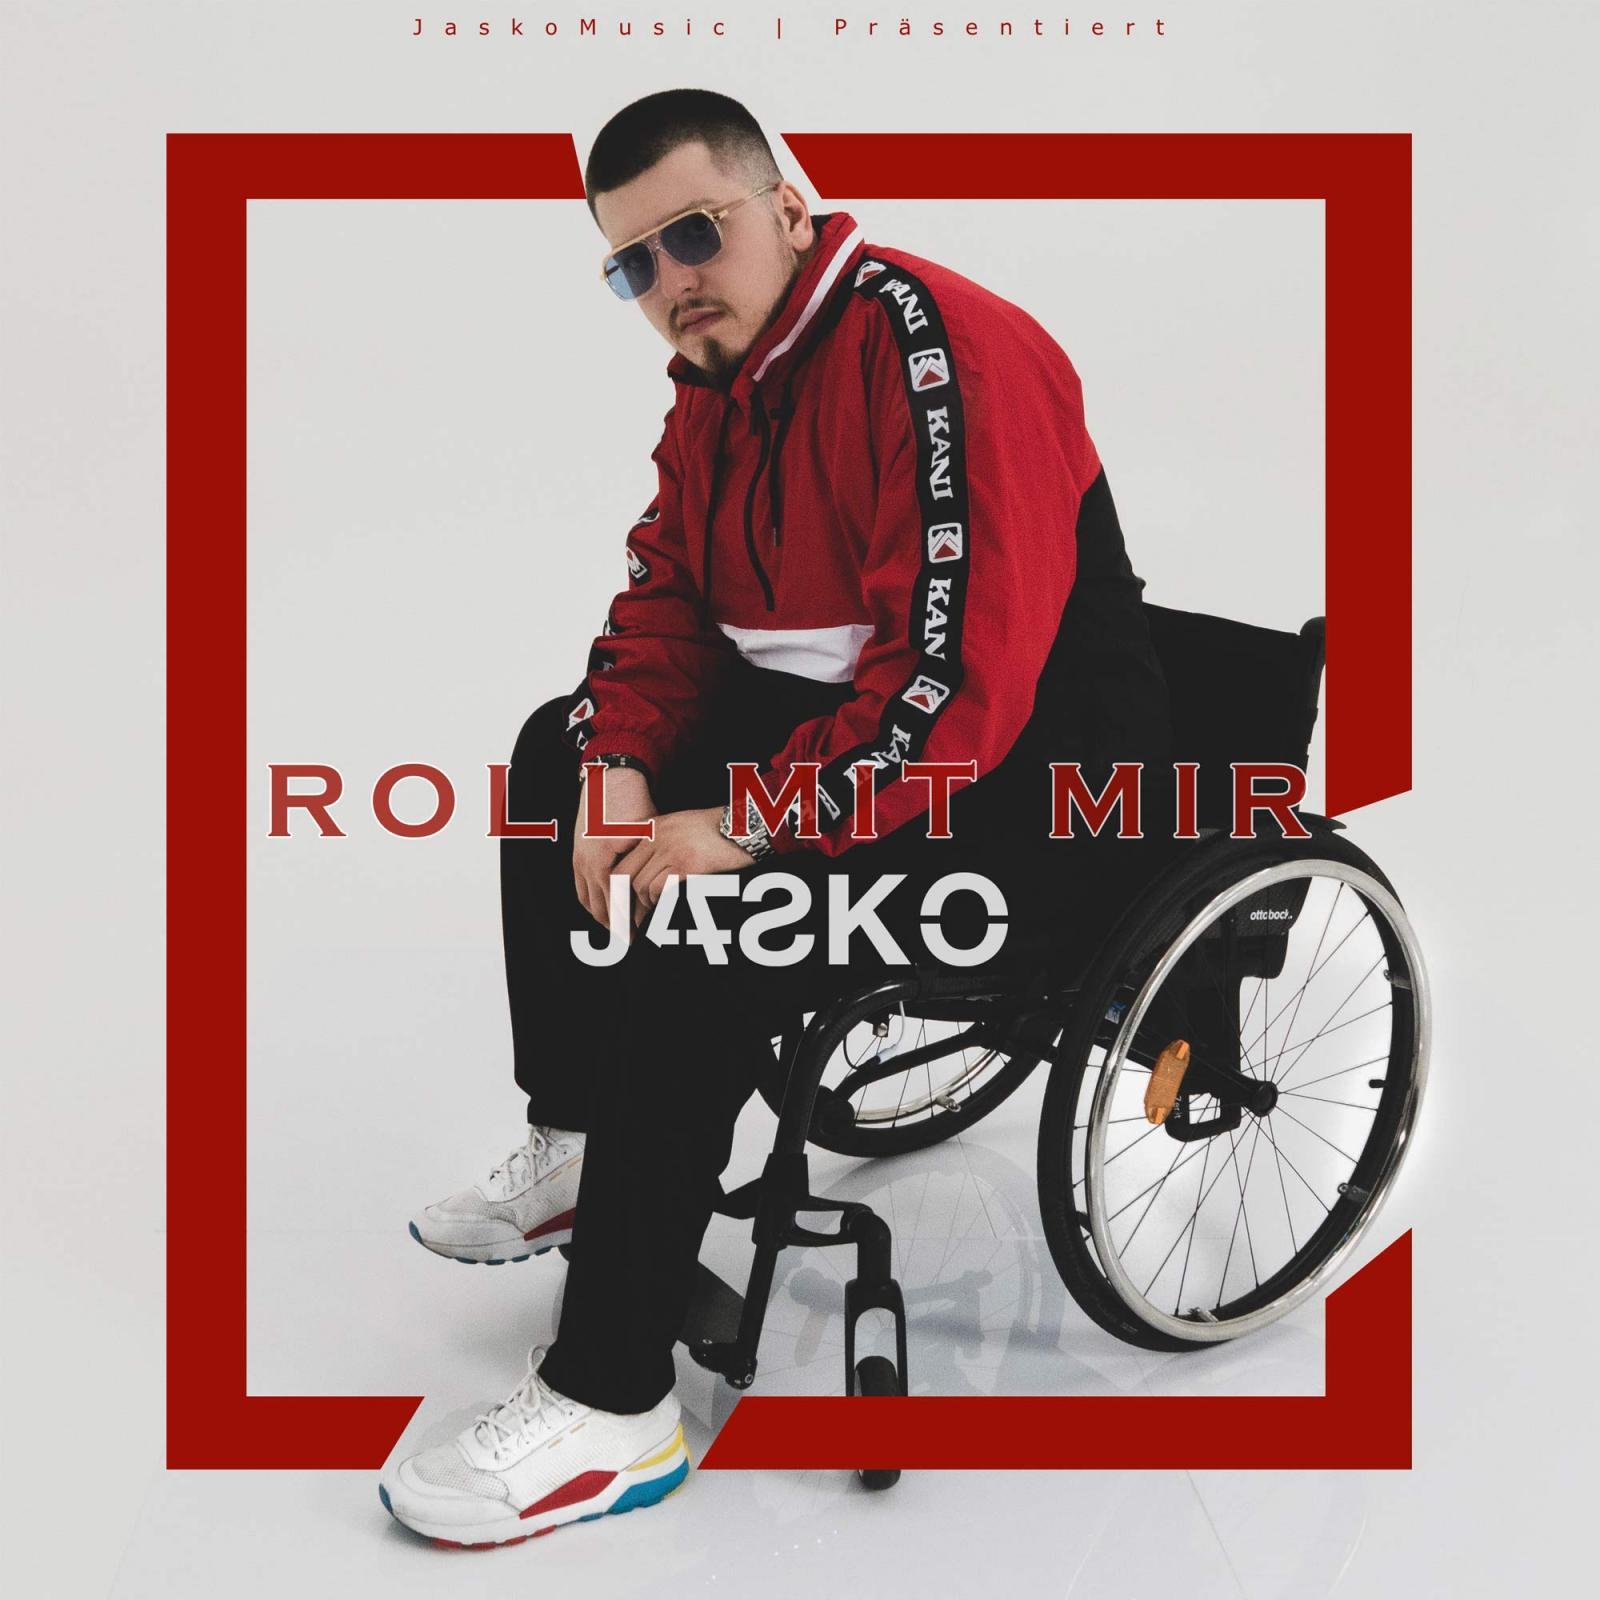 Upcoming: Jasko47 - Roll Mit Mir